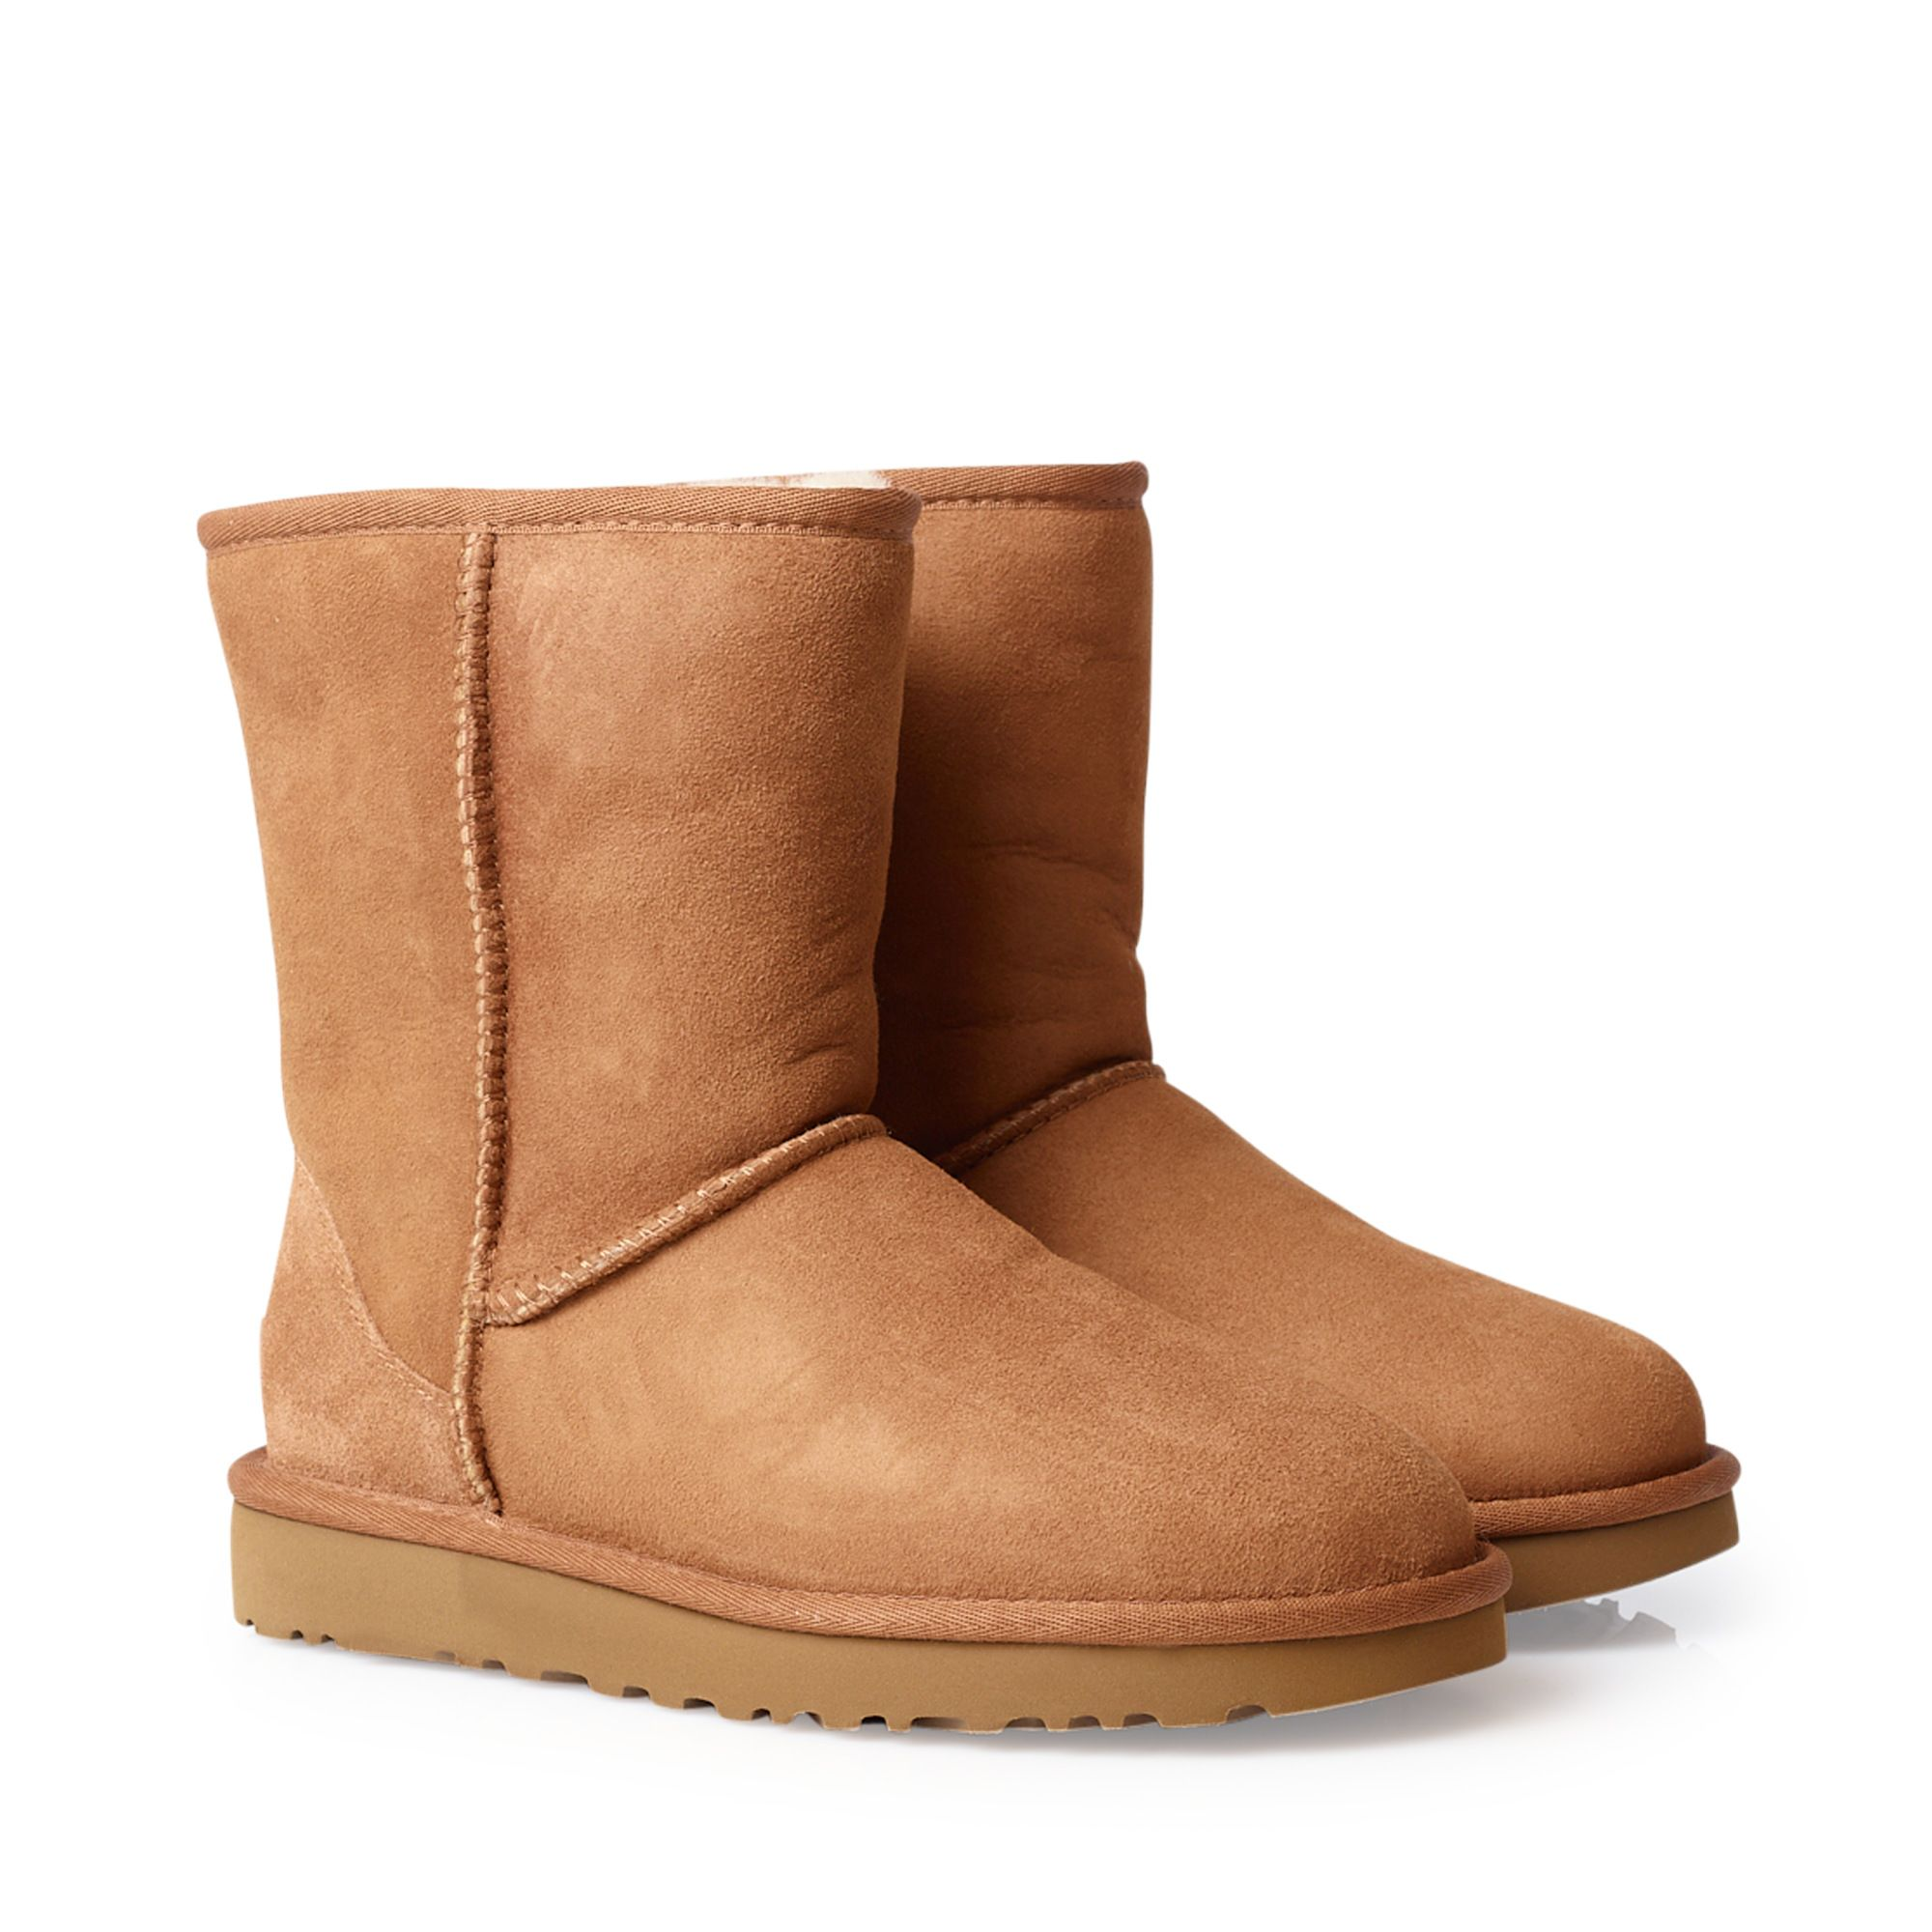 dbe99c4d582 UGG Classic Short boots i fårskinn, Cognac, 5 UGG - KompisShopping